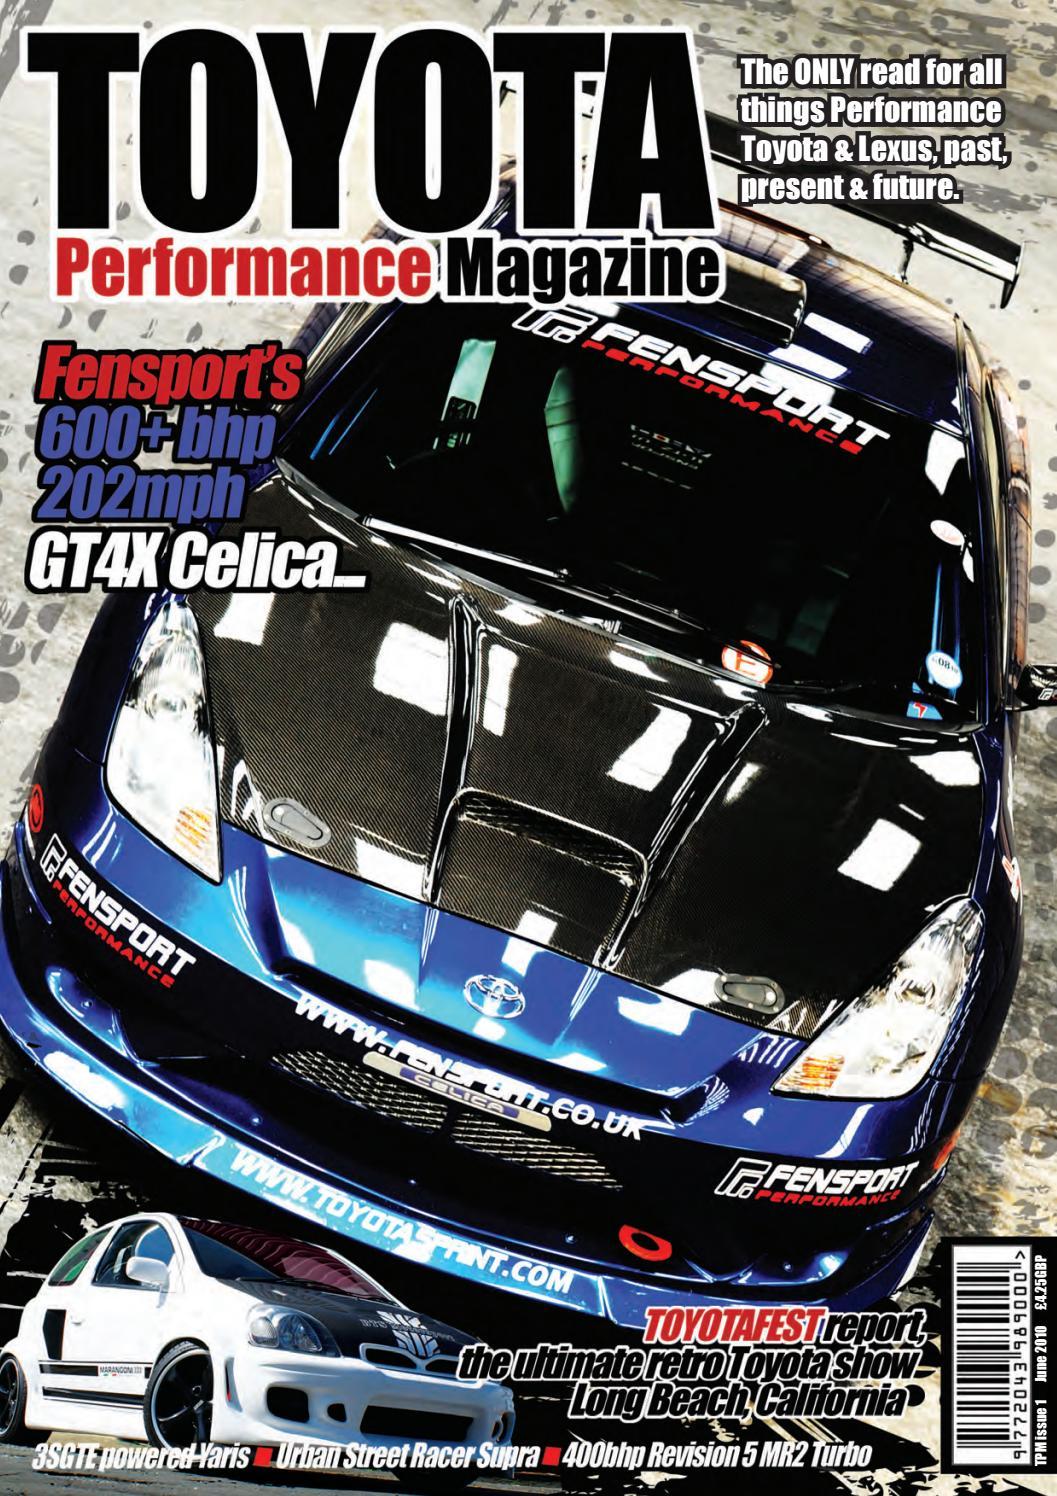 FORGE MOTORSPORT TUNING PERFORMANCE RACING JDM T-SHIRT